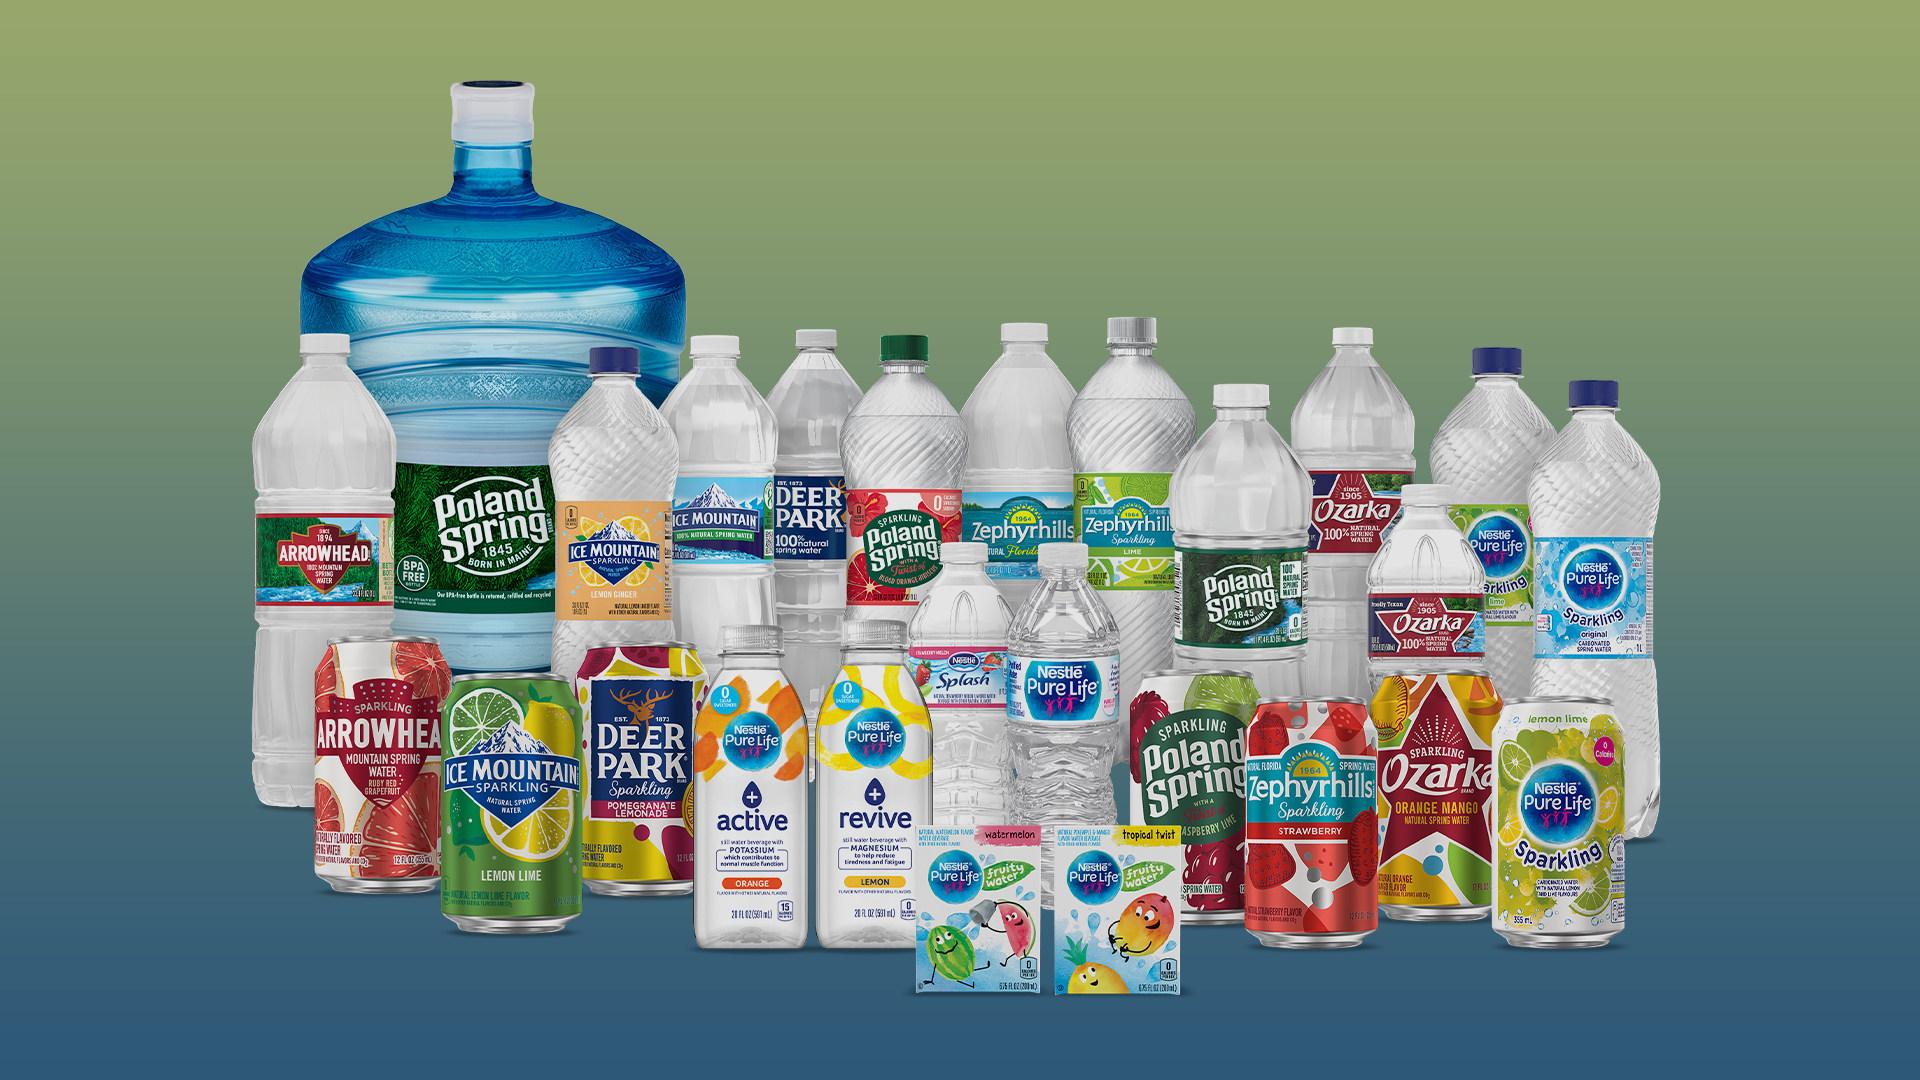 NWNA BlueTriton Brands